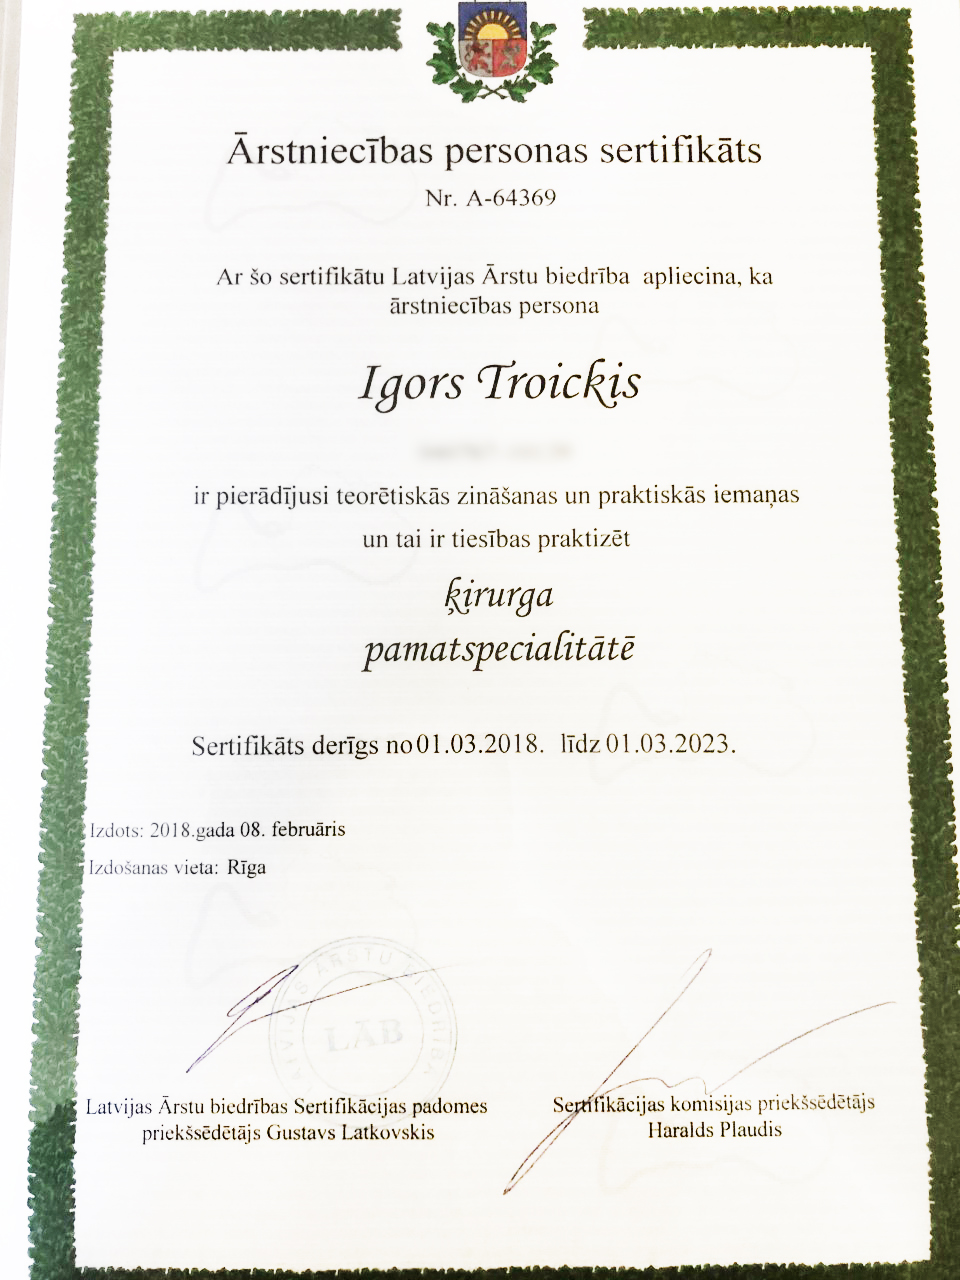 Sertifikāts - Dr. Troickis